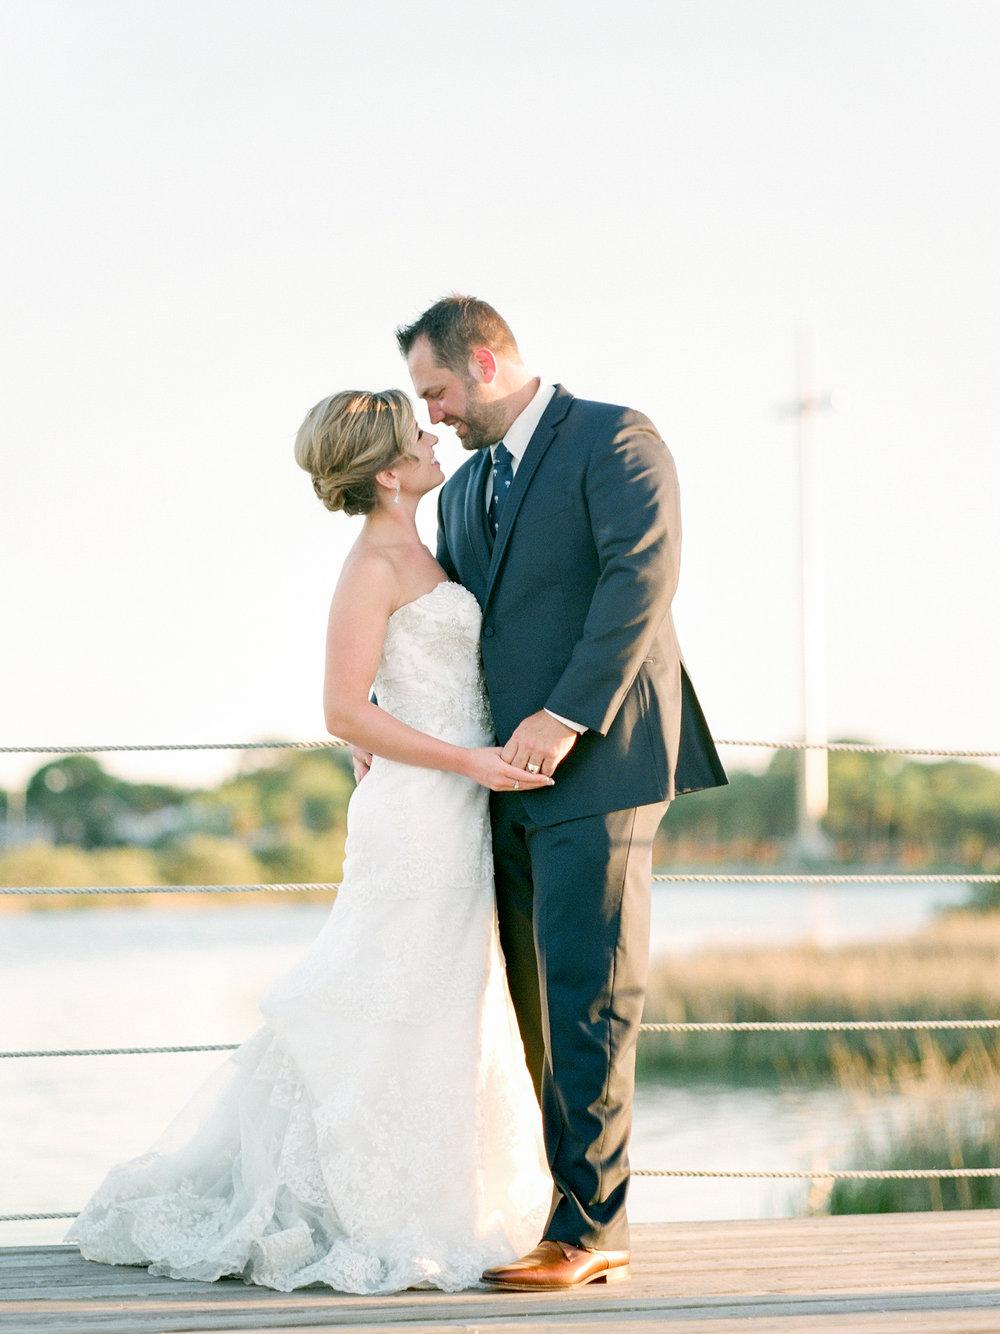 Lisa Silva Photography- Jacksonville, Florida Fine Art Film Wedding Photography (73 of 203).jpg